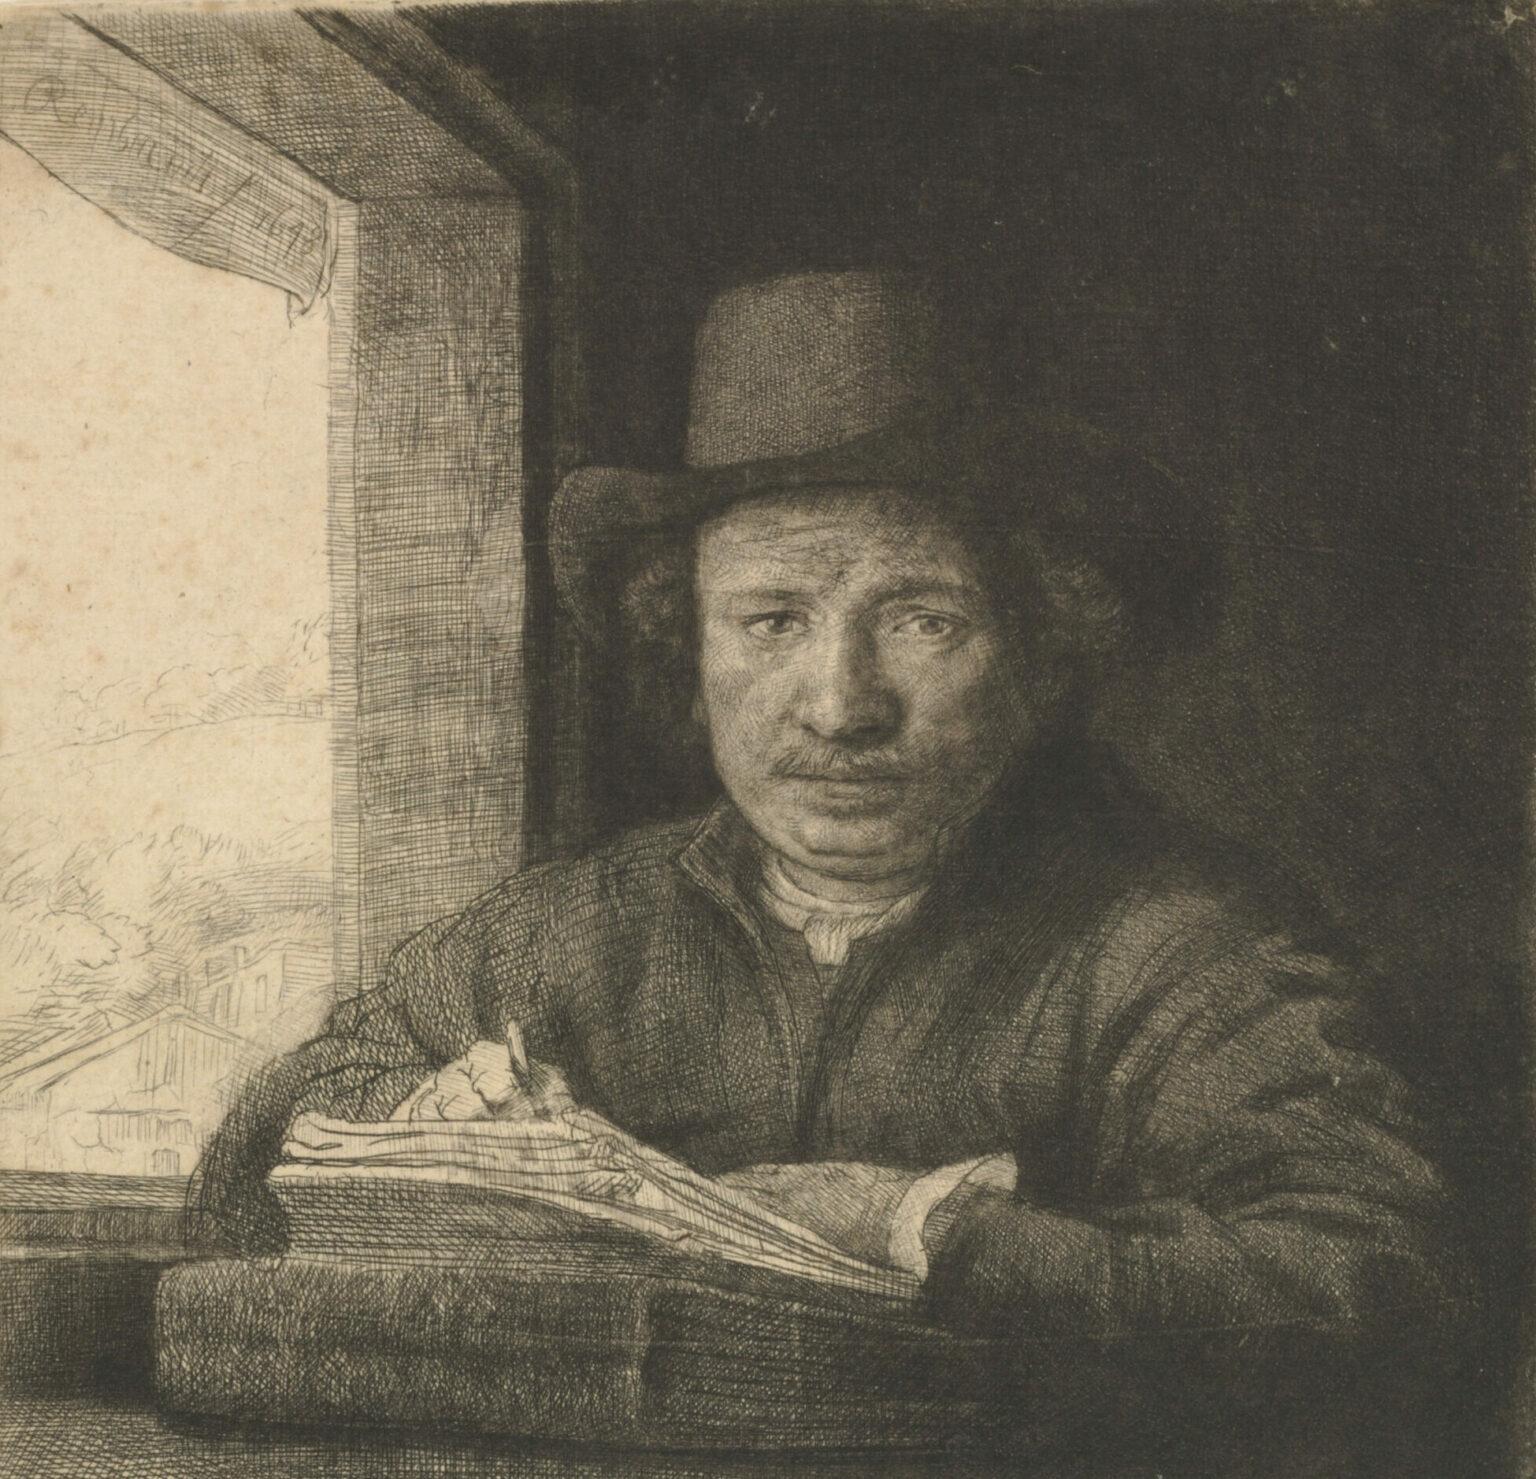 Rembrandt van Rijn. Self-Portrait Etching at a Window. 1648. The Baltimore Museum of Art: Garrett Collection, BMA 1946.112.777